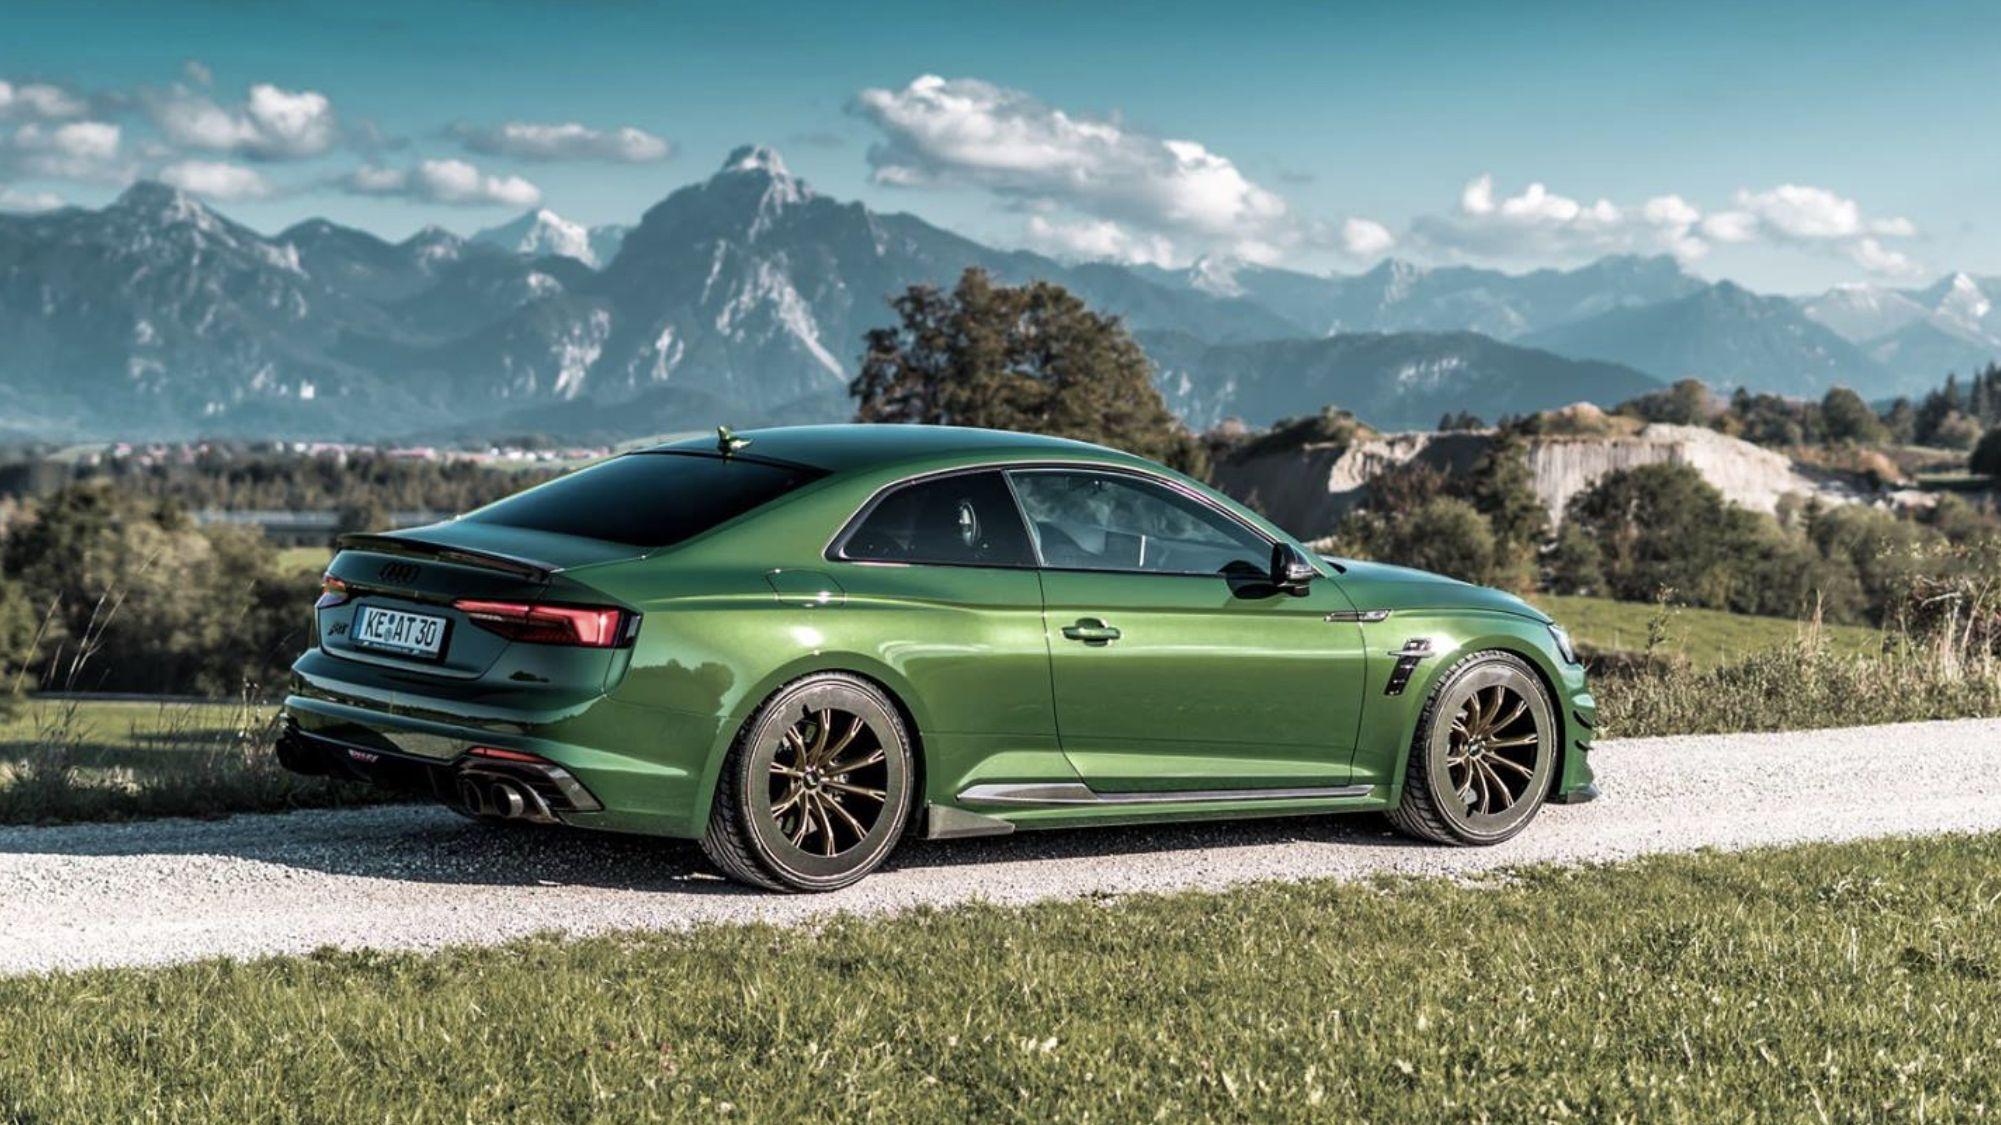 Audi Rs5 Audi Audi Rs5 Lamborghini Gallardo